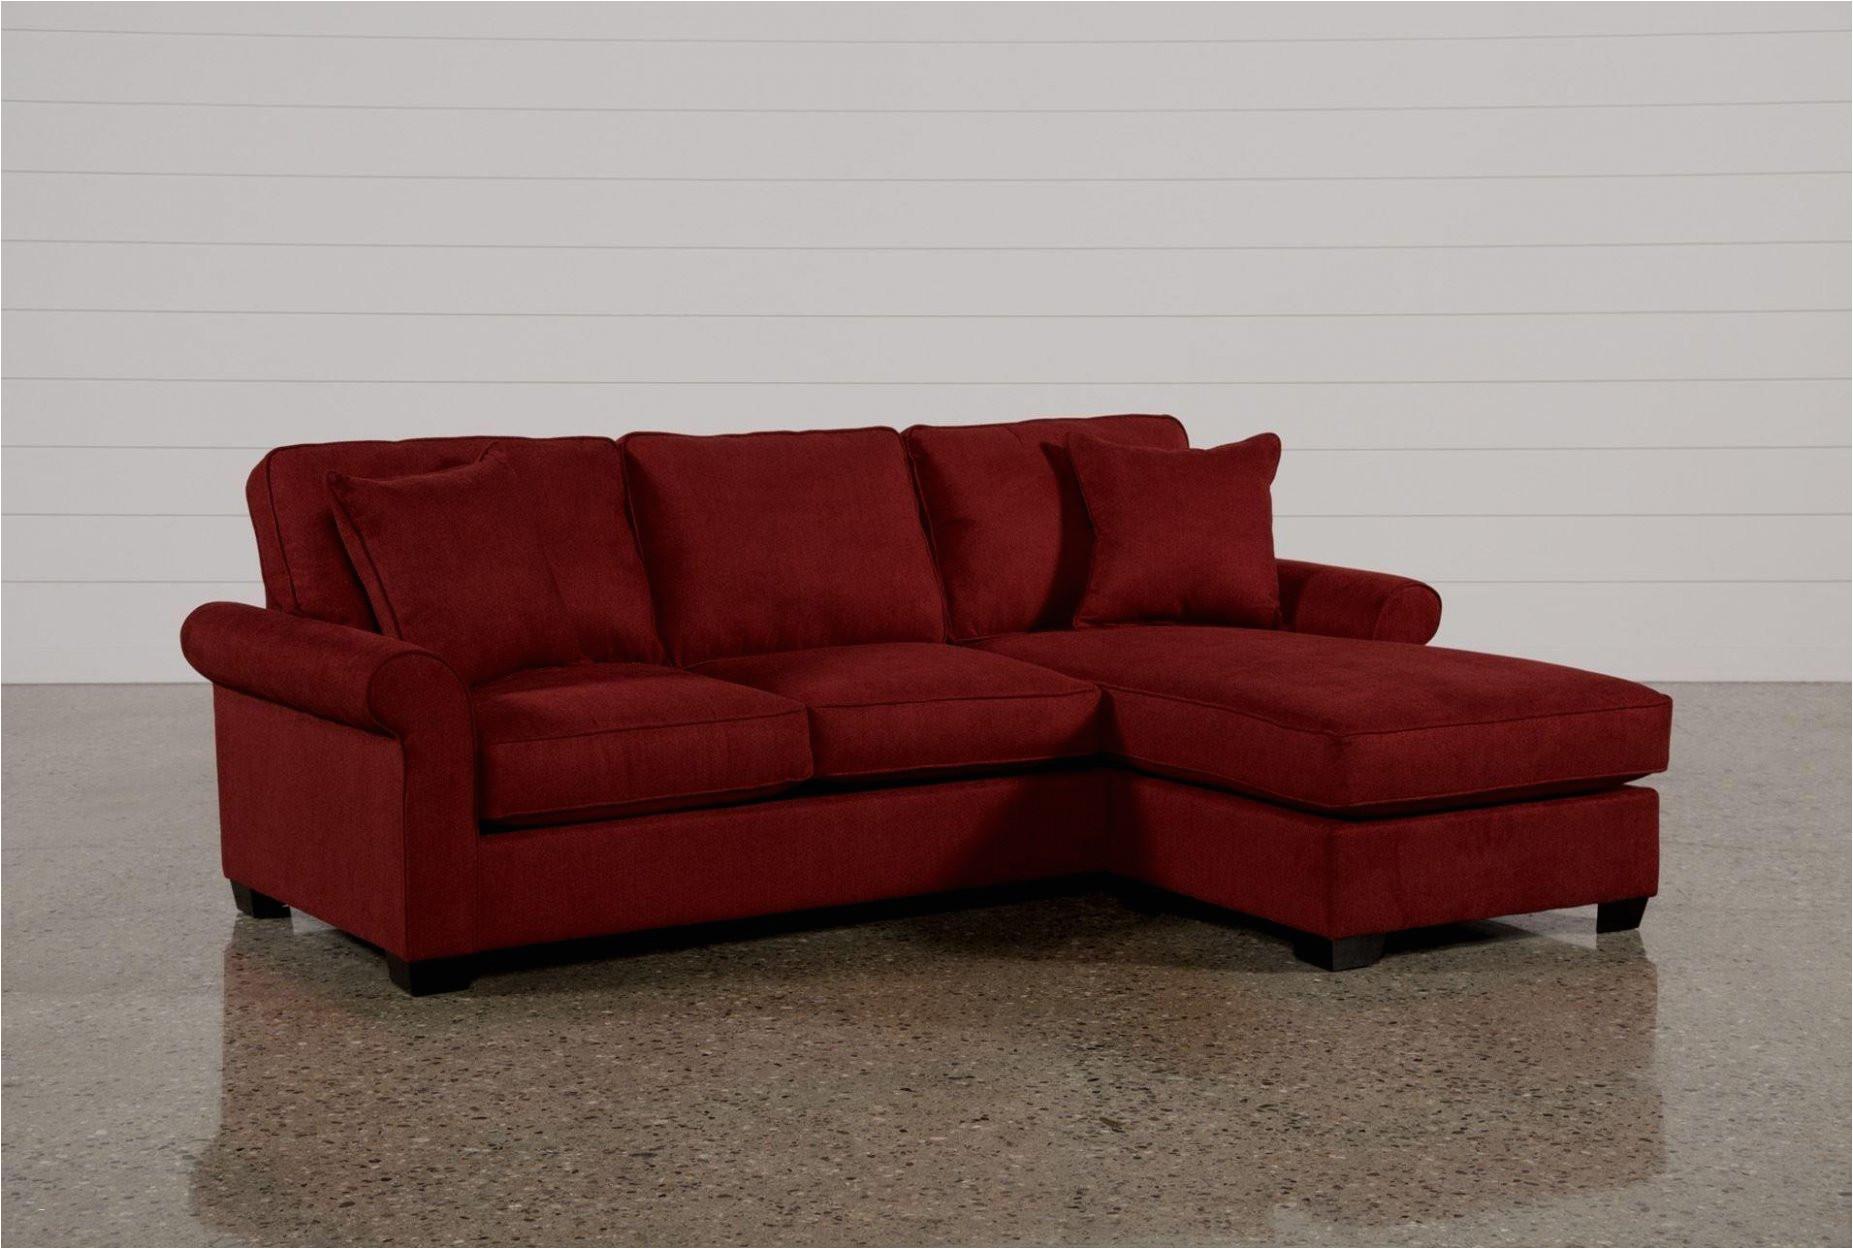 contemporary sofa set fresh furniture best leather loveseats leather loveseats 0d furnitures